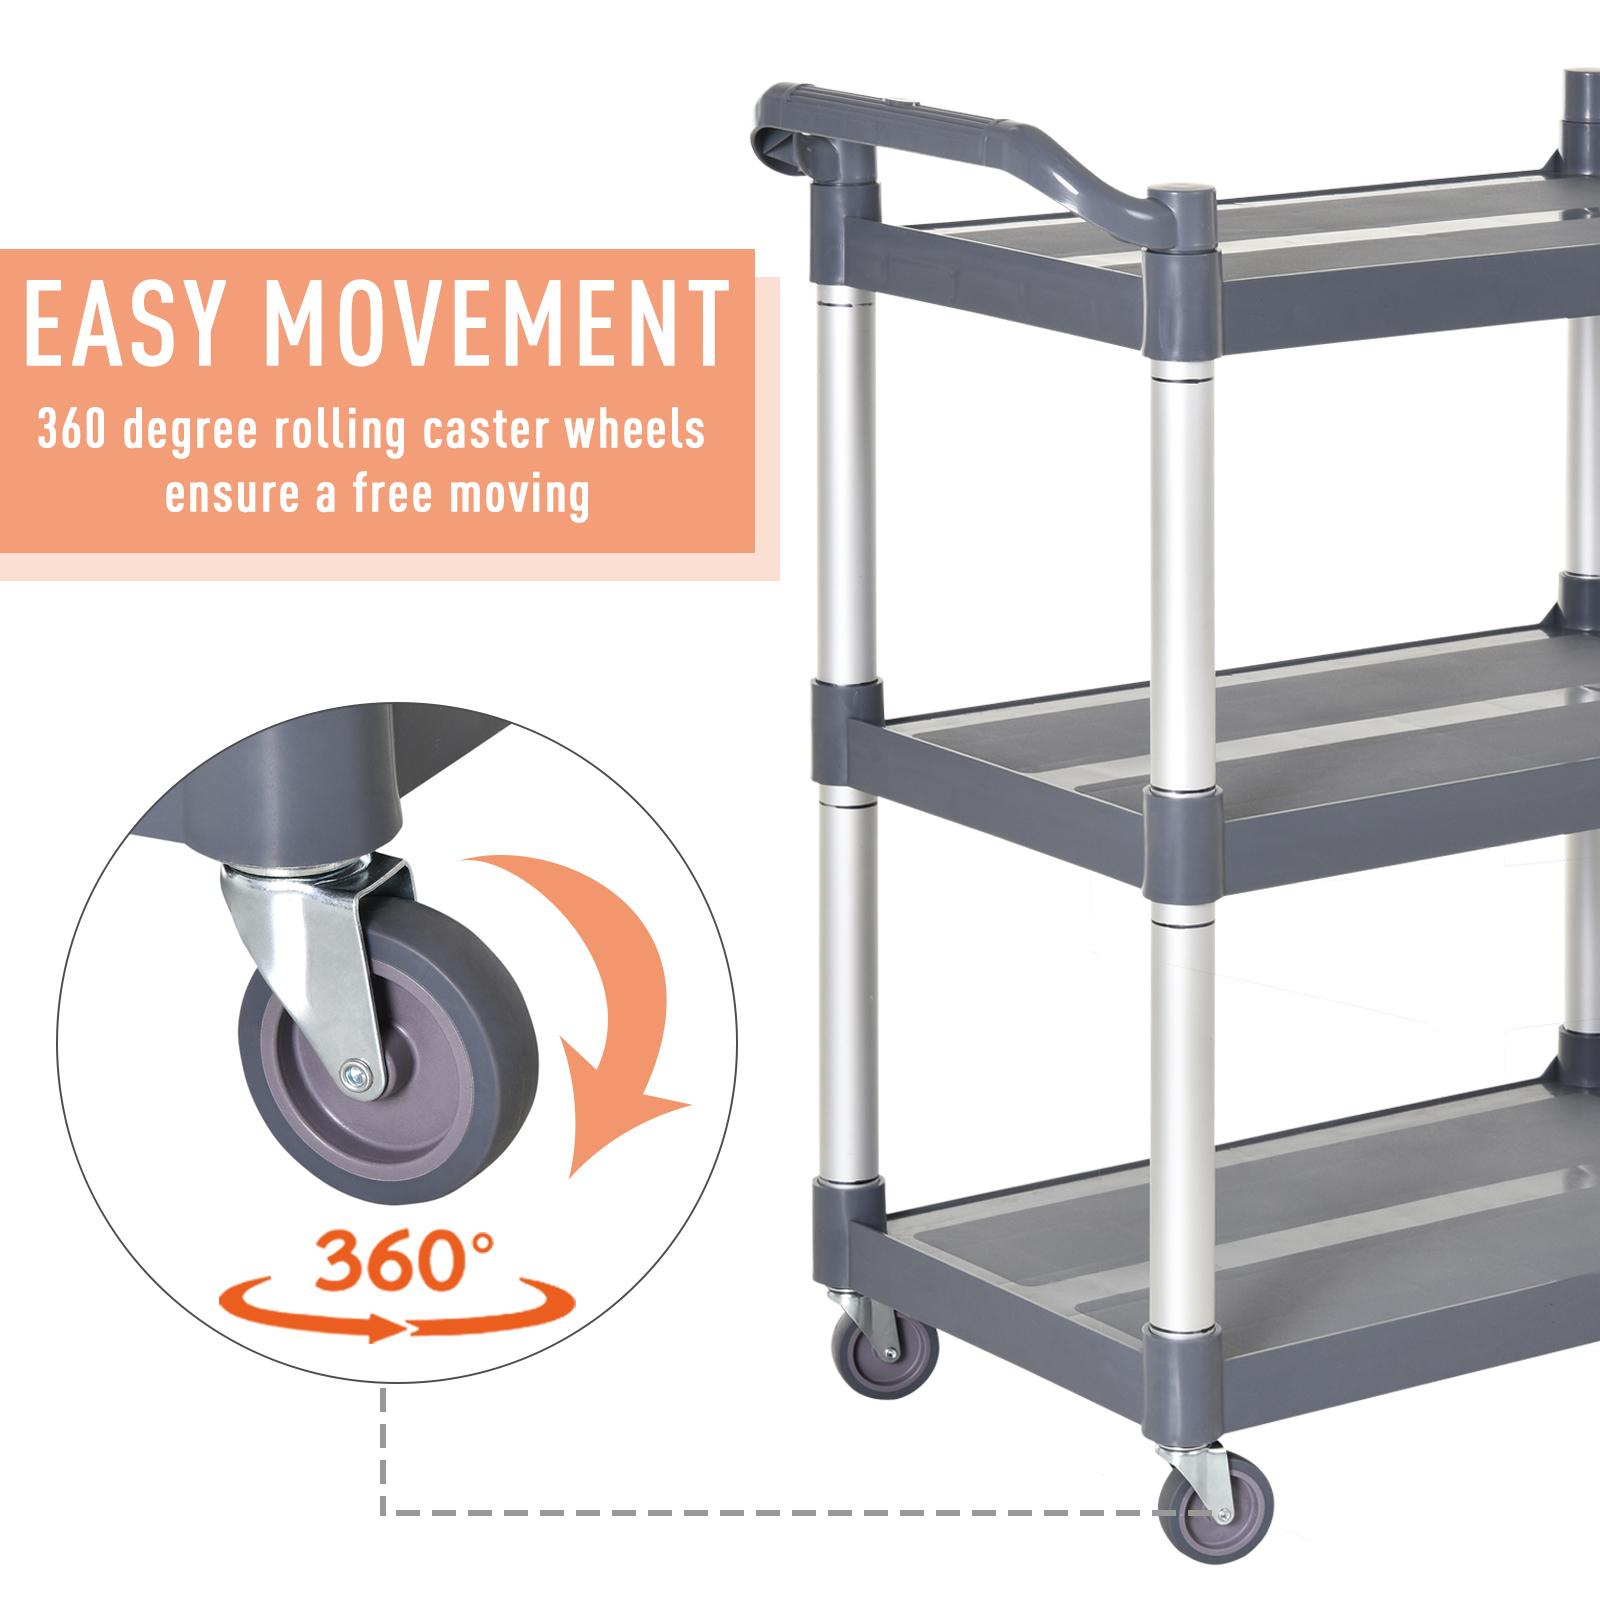 HOMCOM-3-Tier-Metal-Trolley-Serving-Cart-Free-Moving-Kitchen-Livingroom thumbnail 3